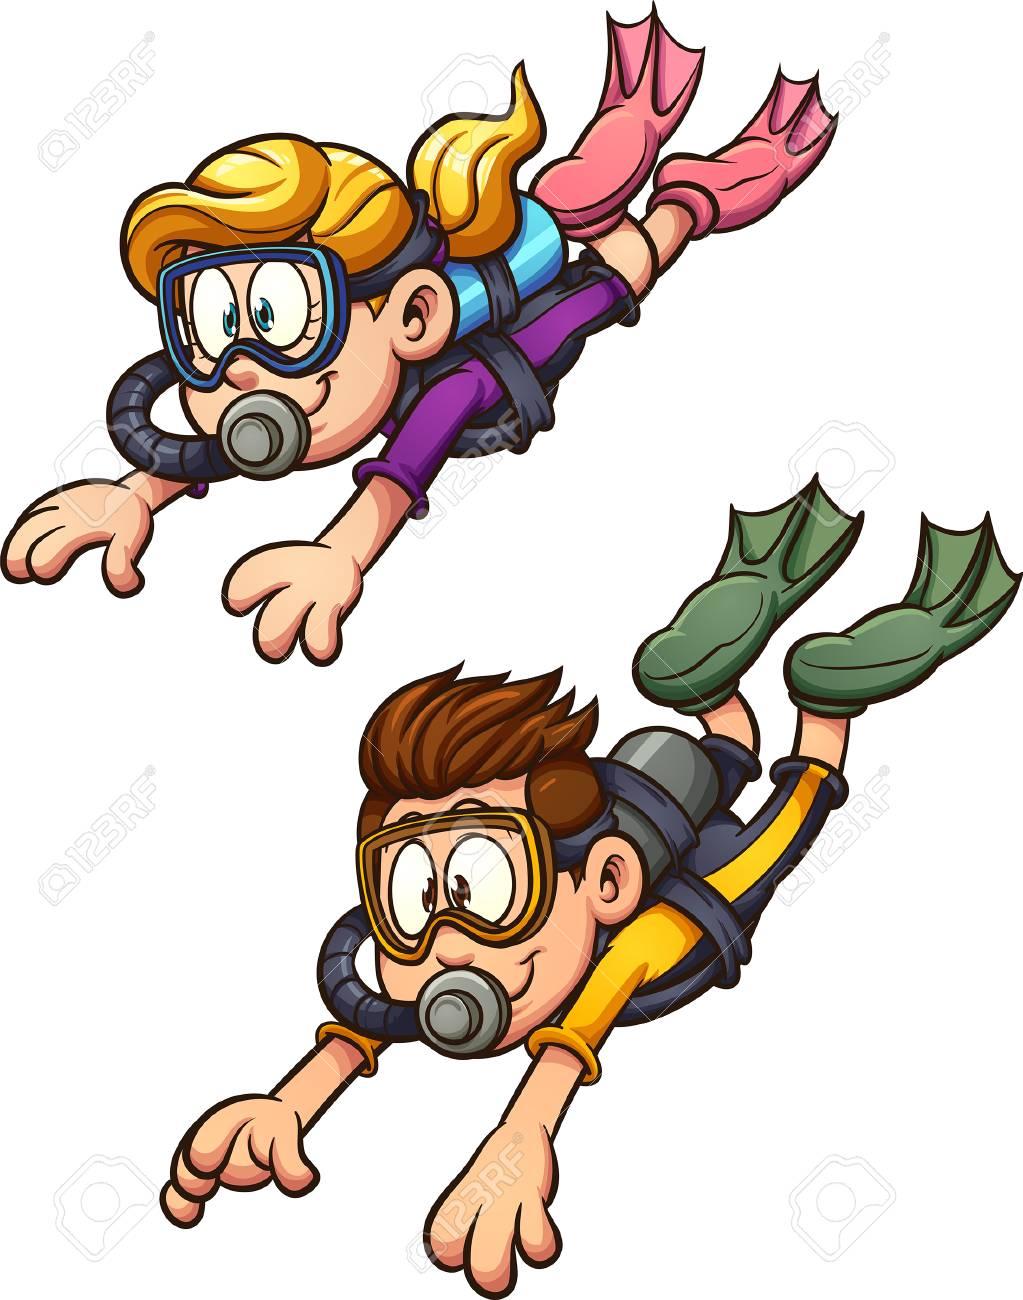 Scuba diving kids. Vector clip art illustration with simple gradients.